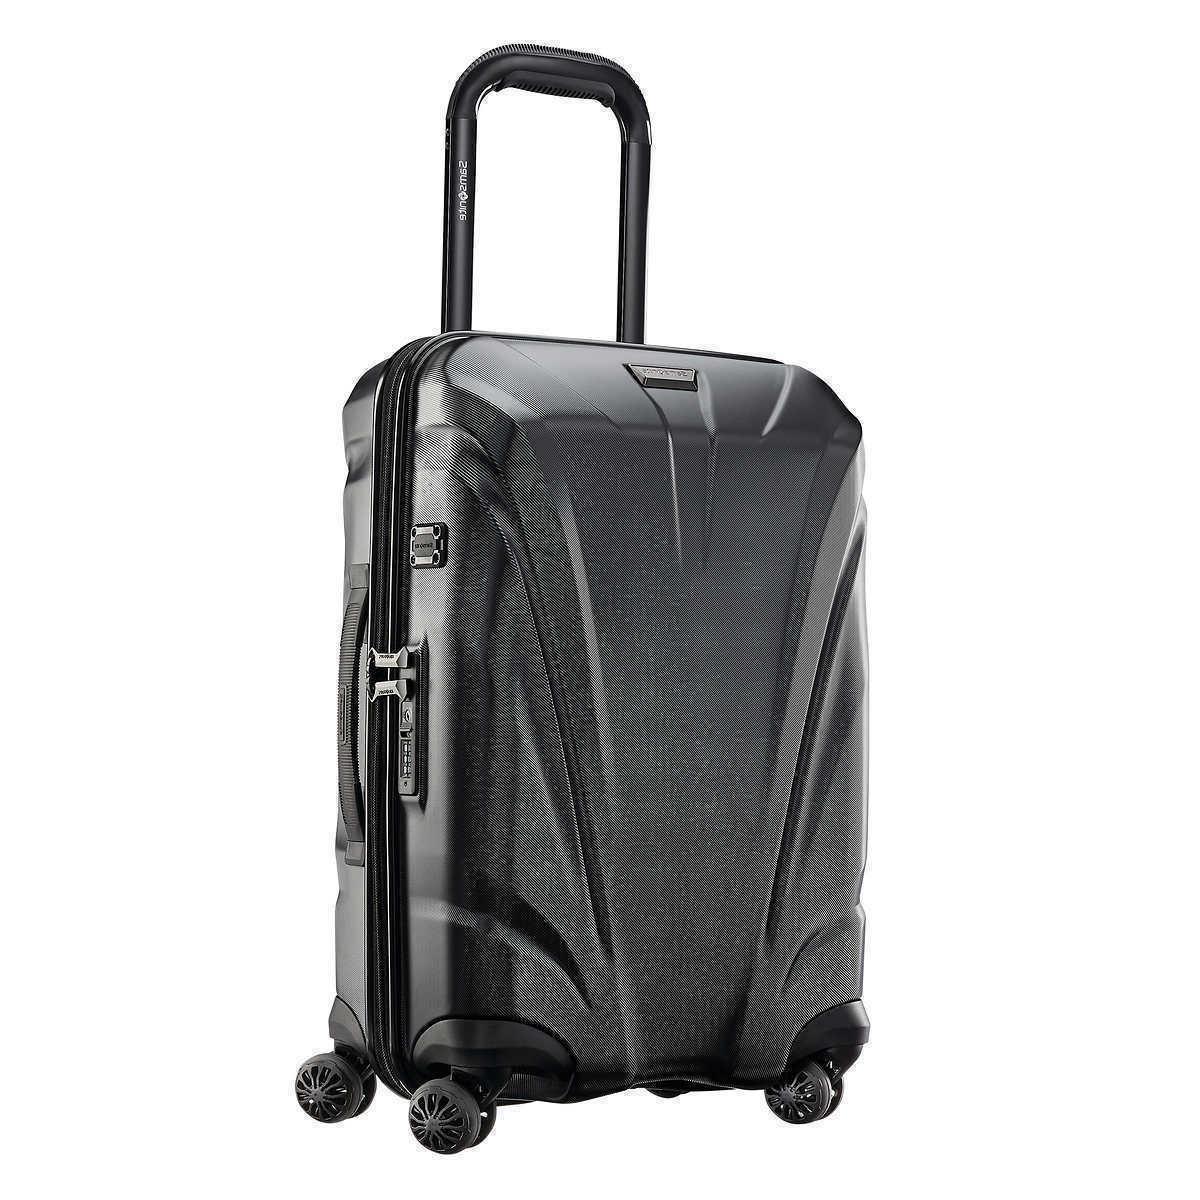 xcalibur xlt hardside carry on luggage spinner